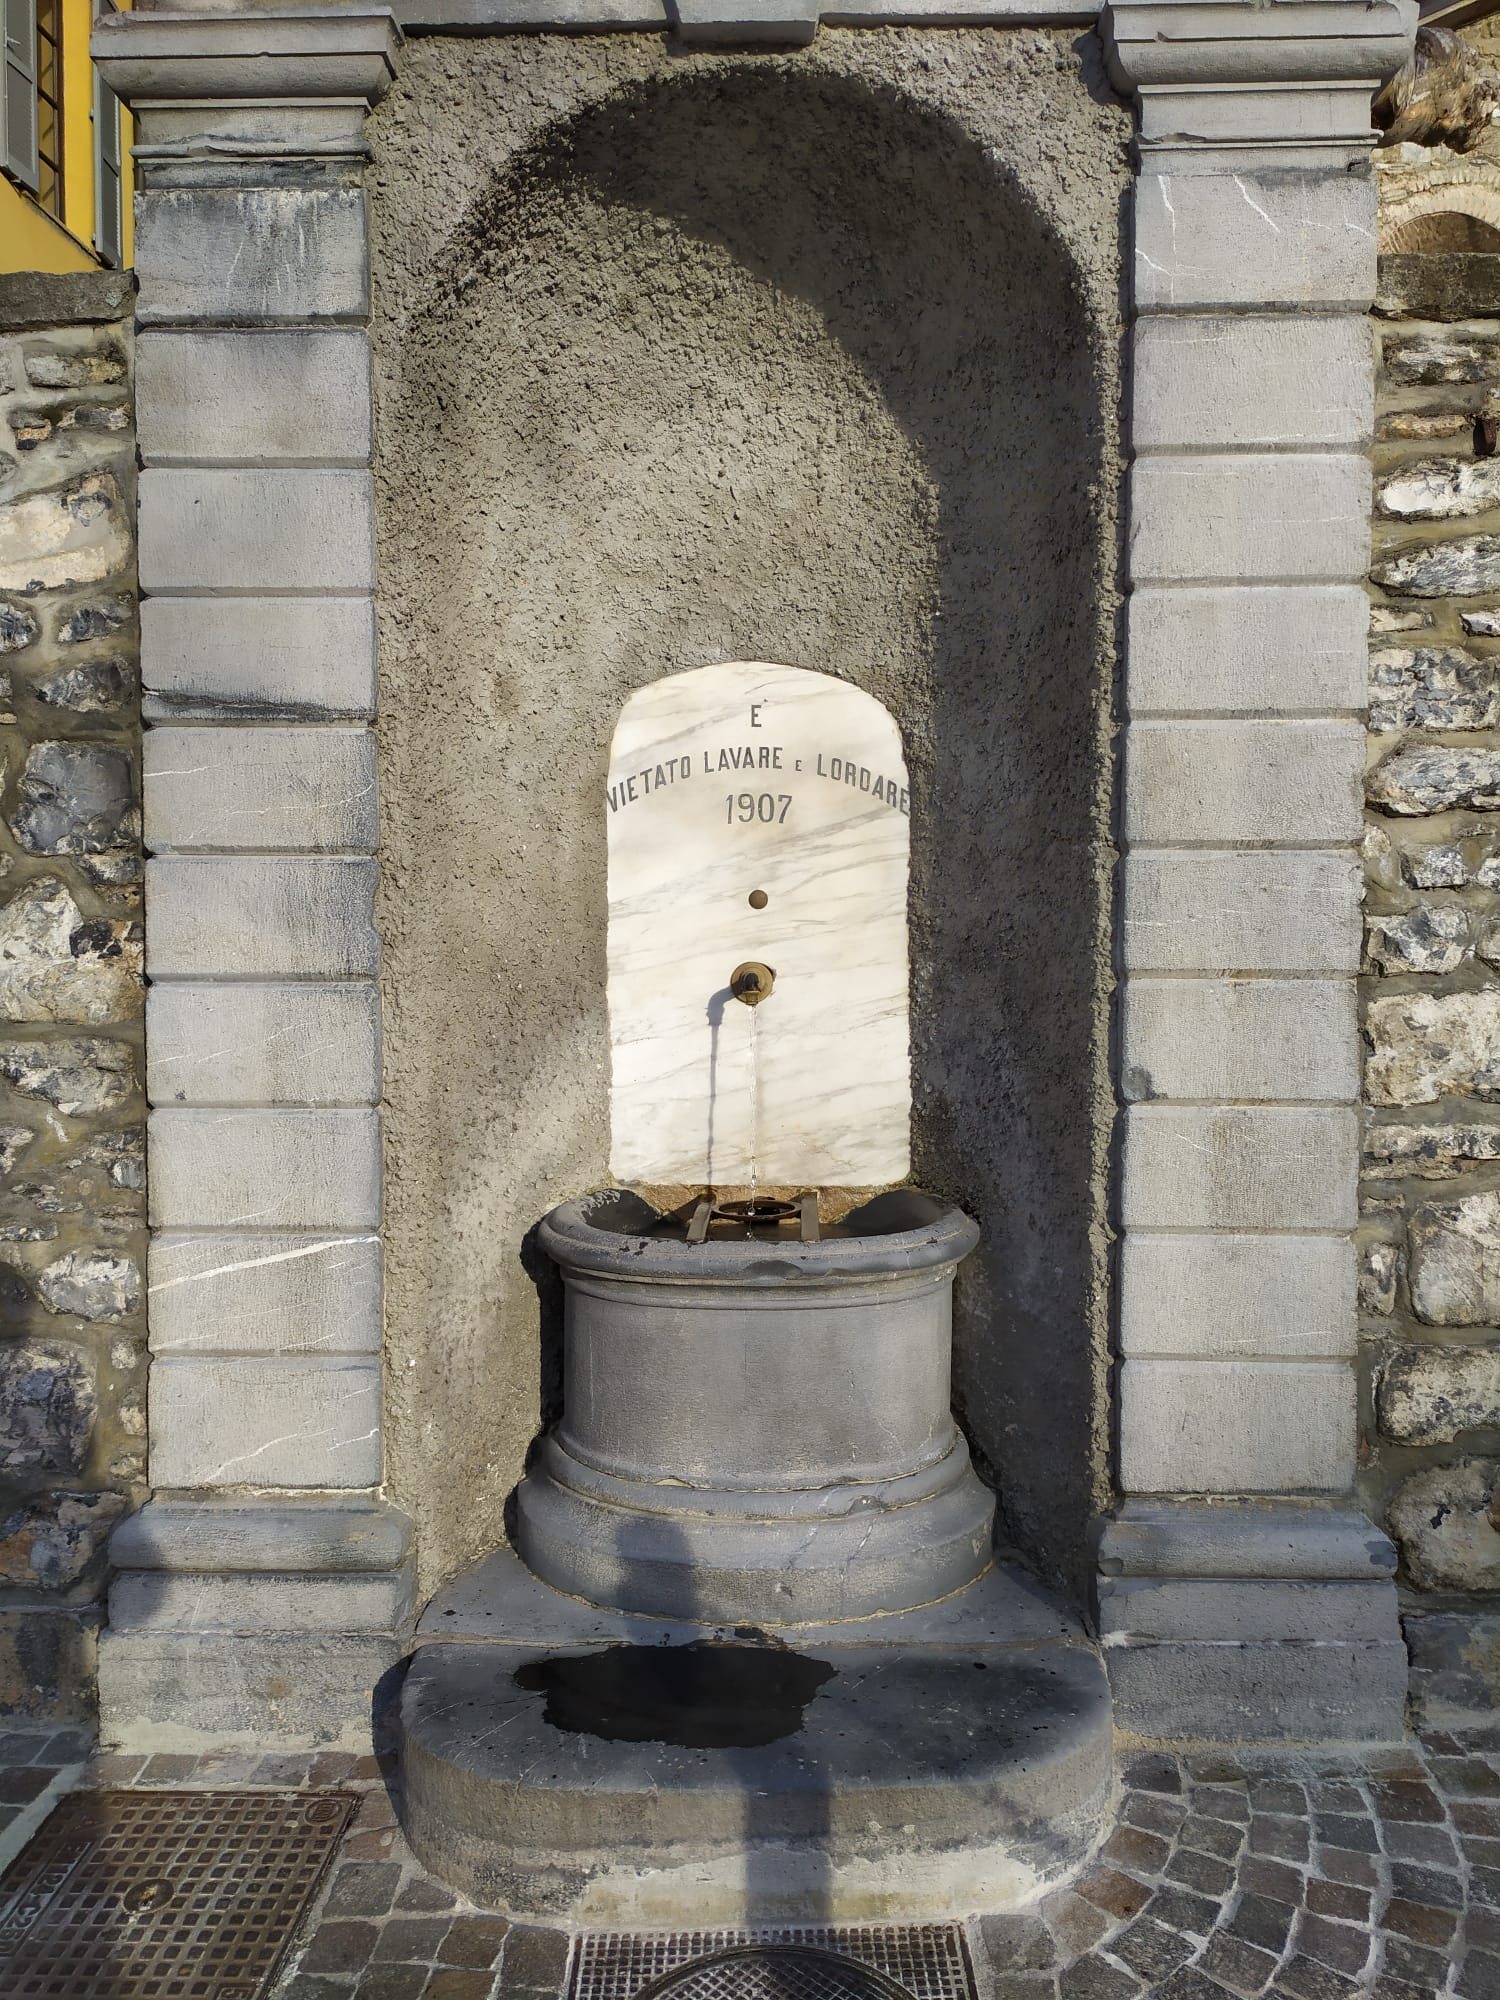 fontana in Piazza S. Giorgio varenna